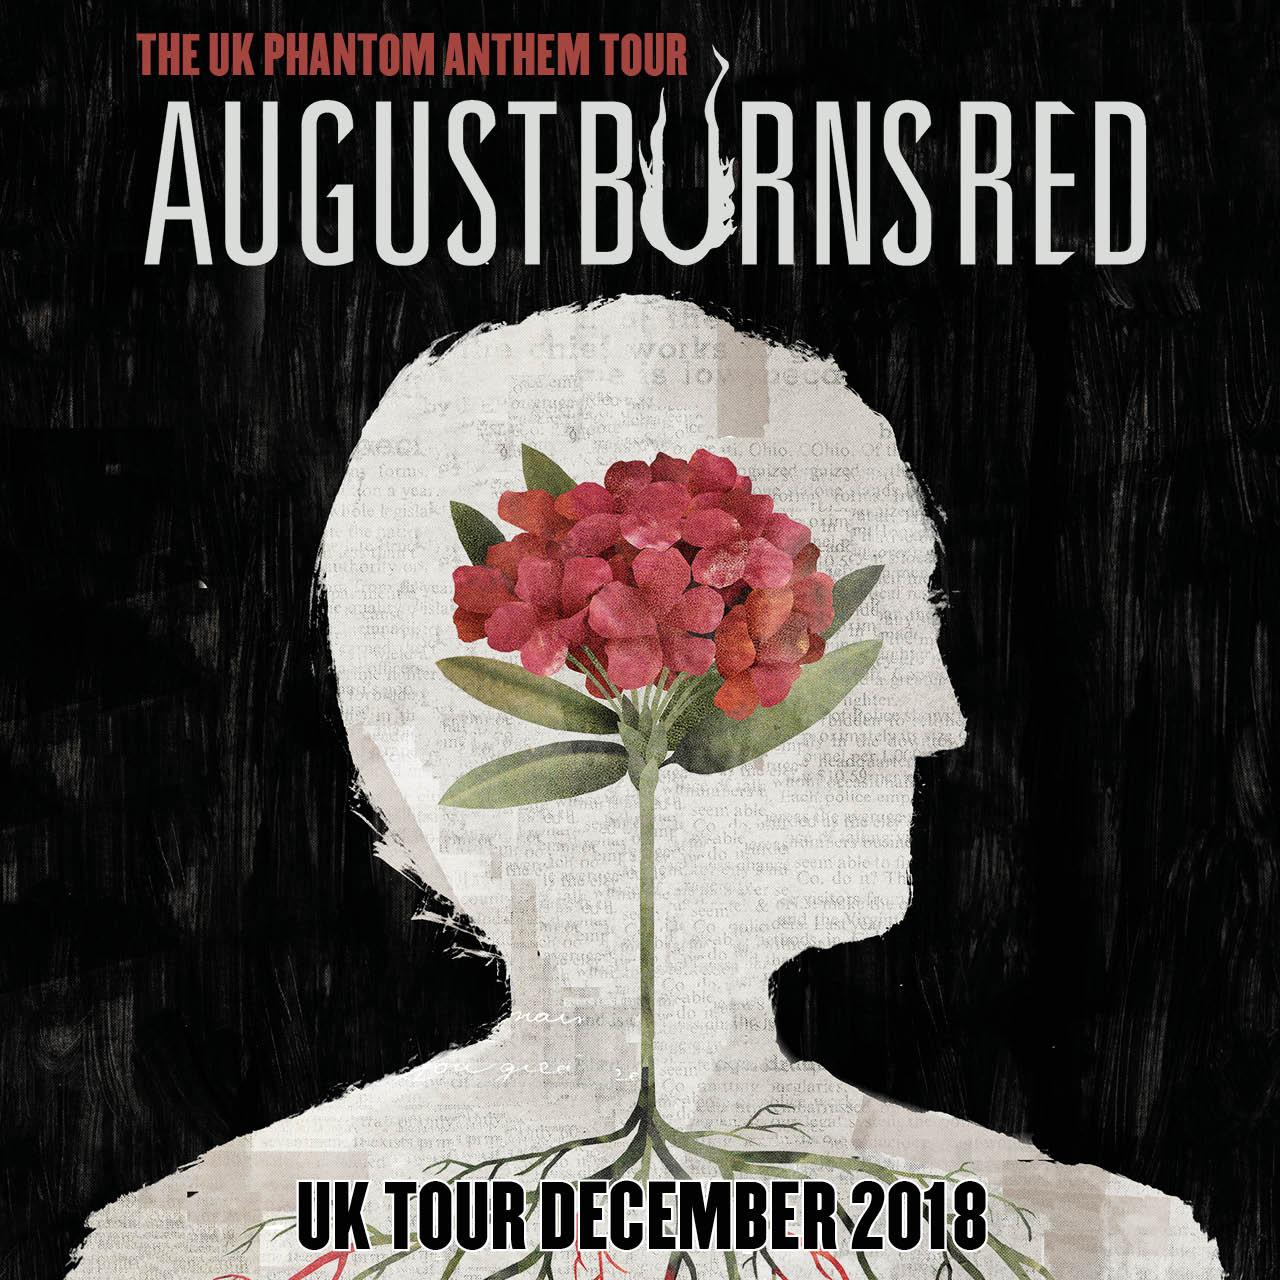 Phantom Sessions Ep August Burns Red: Buy August Burns Red Tickets, August Burns Red Tour